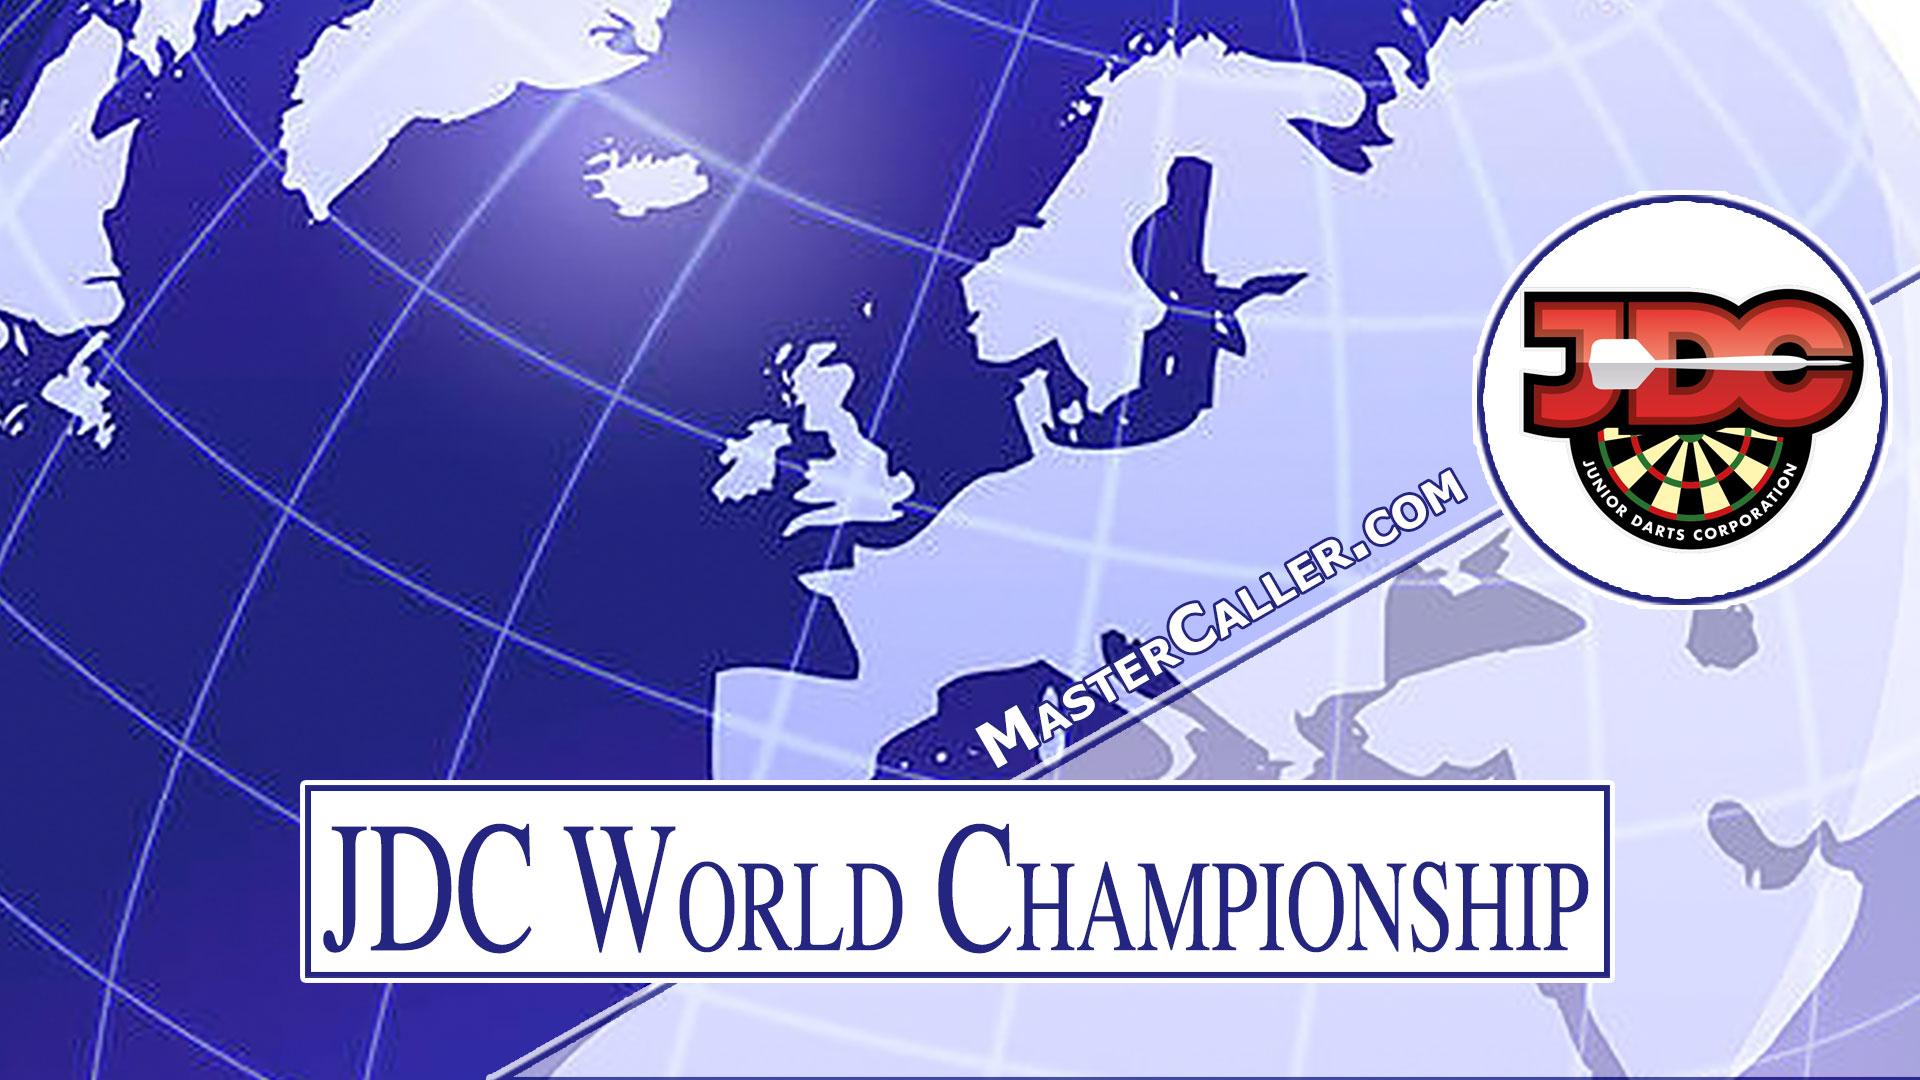 JDC World Championship - 2019 Logo